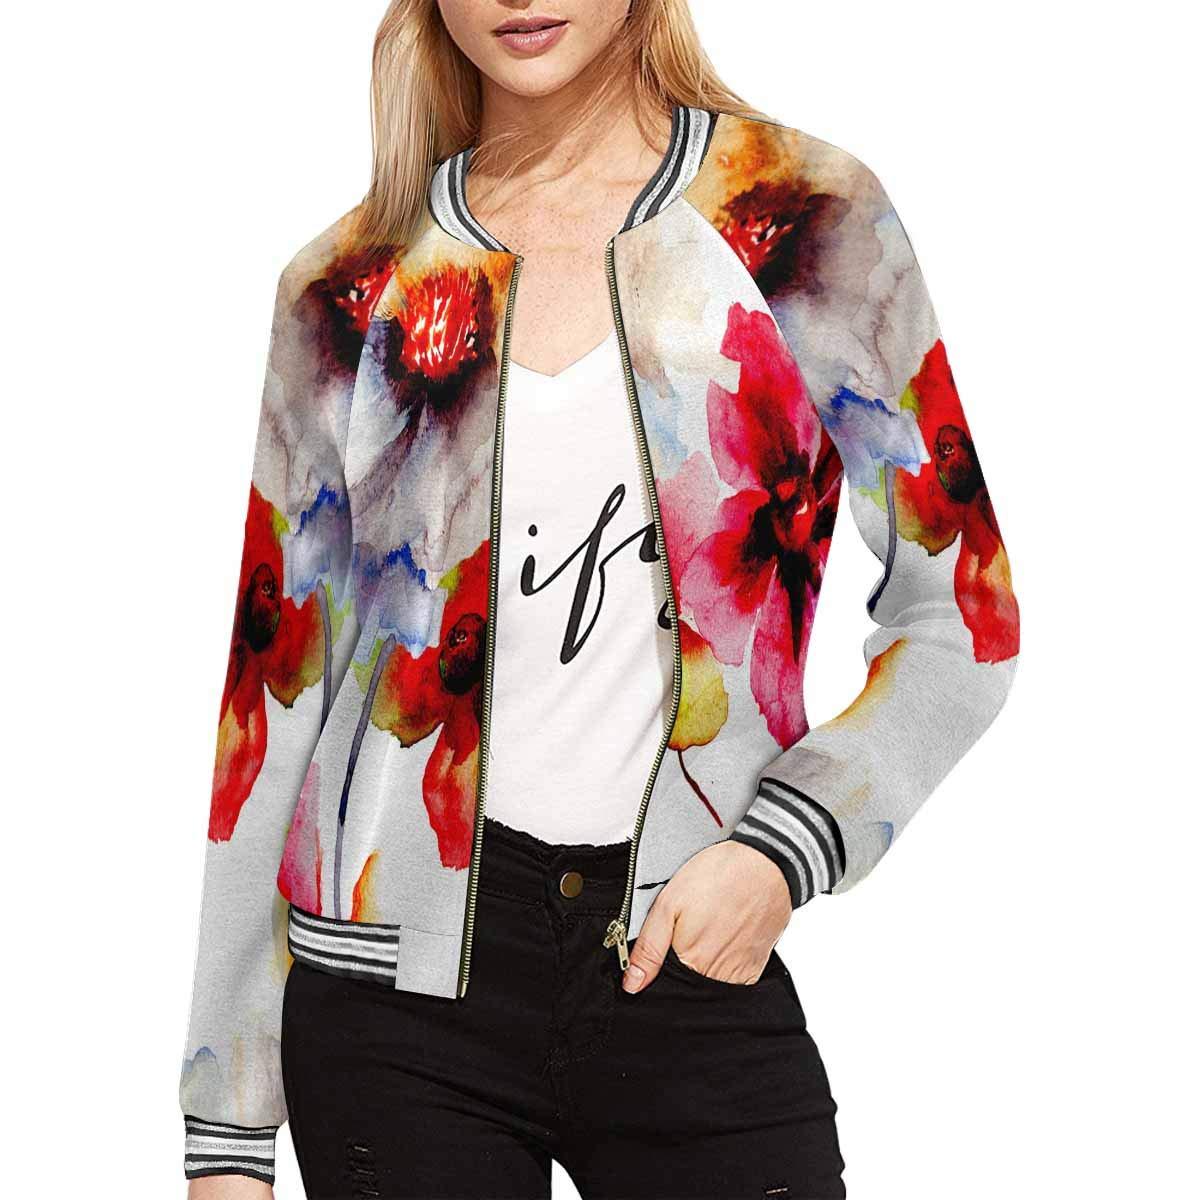 InterestPrint Summer Blossoms Flowers Watercolor Floral Women's Casual Jacket Coat L